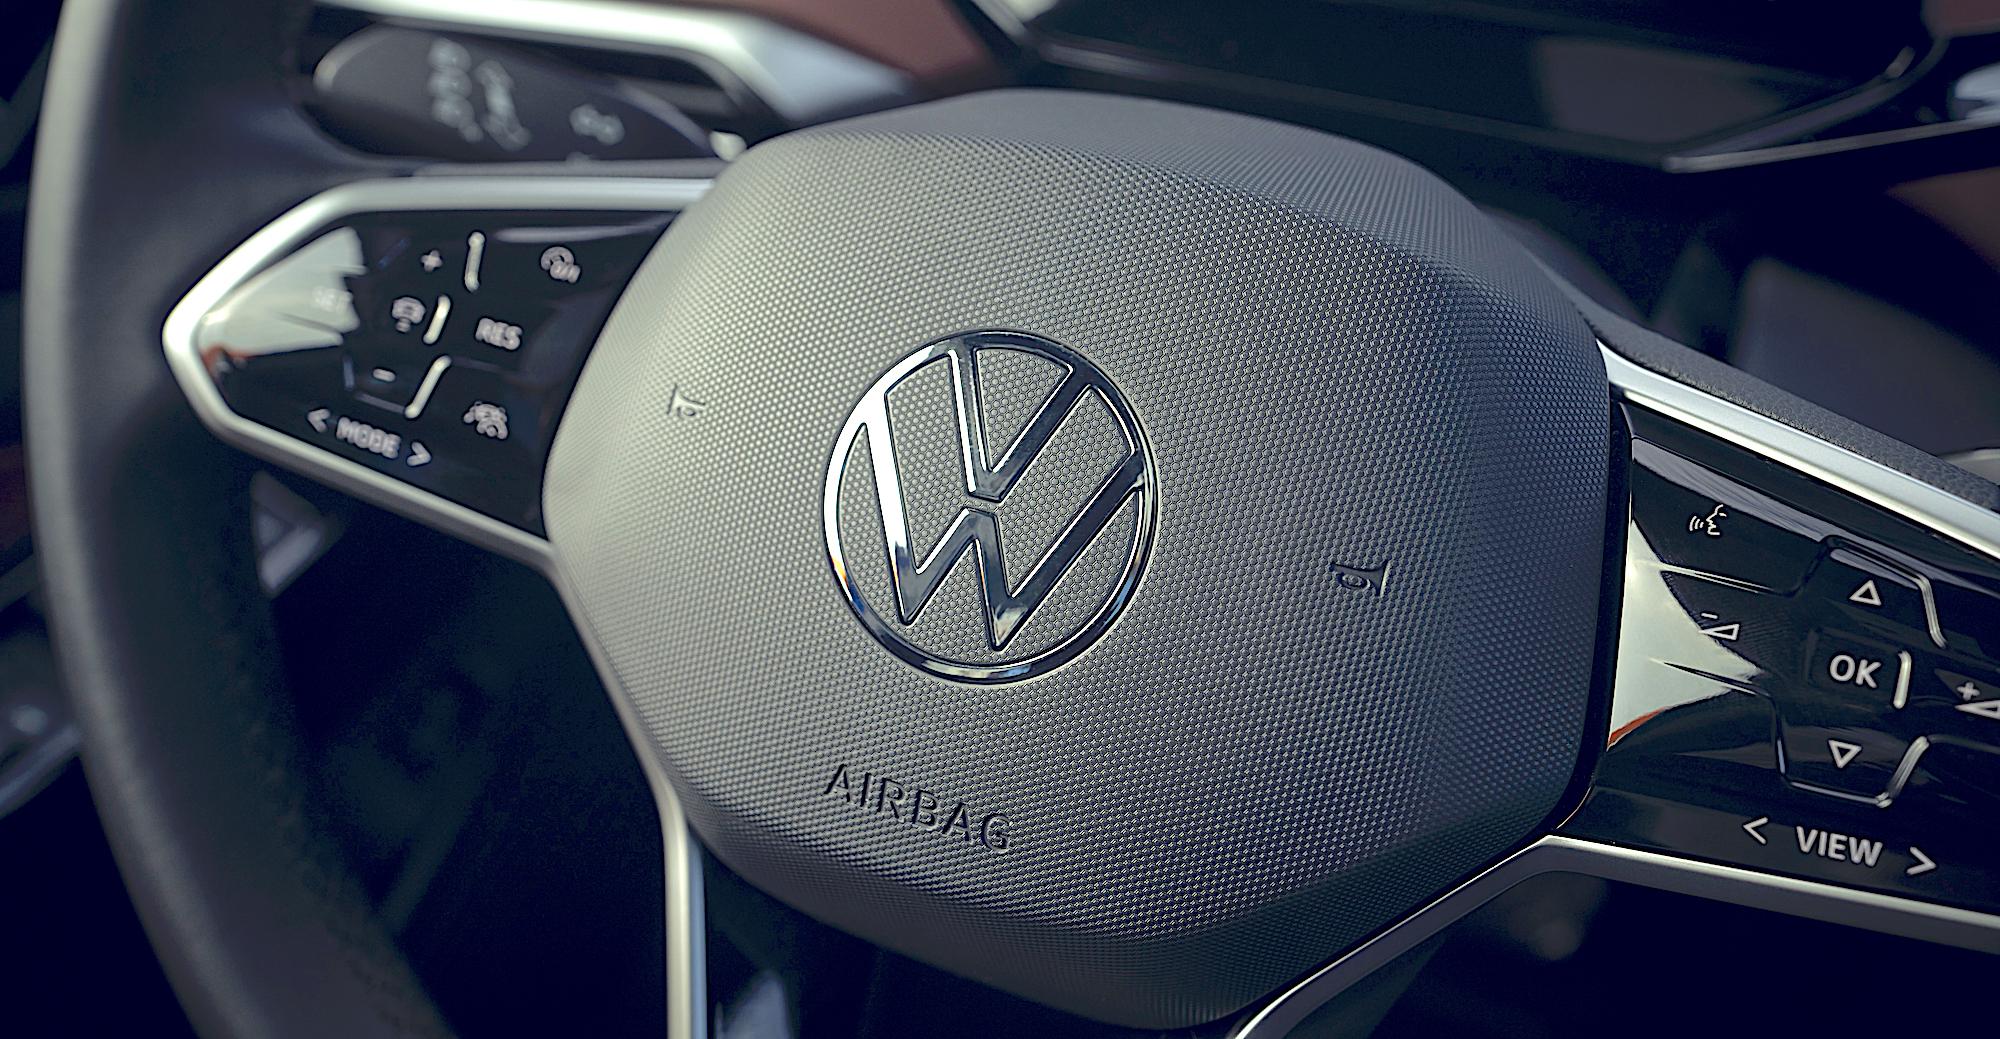 Volant VW ID4 2021.jpg